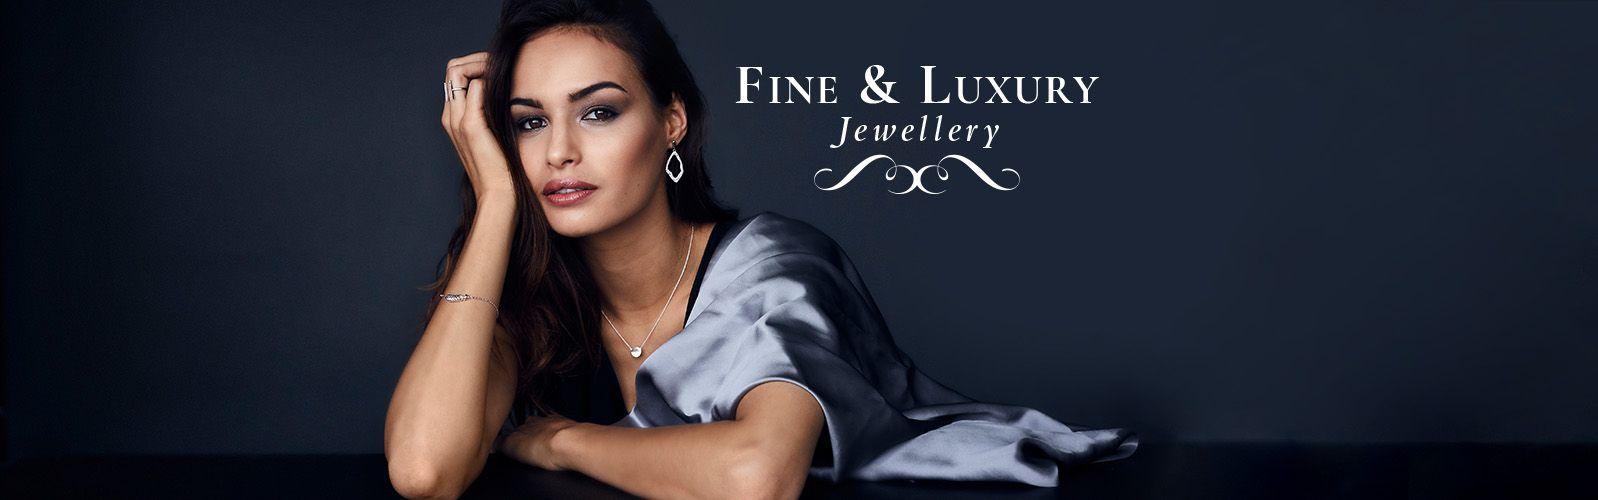 Fine & Luxury Jewellery